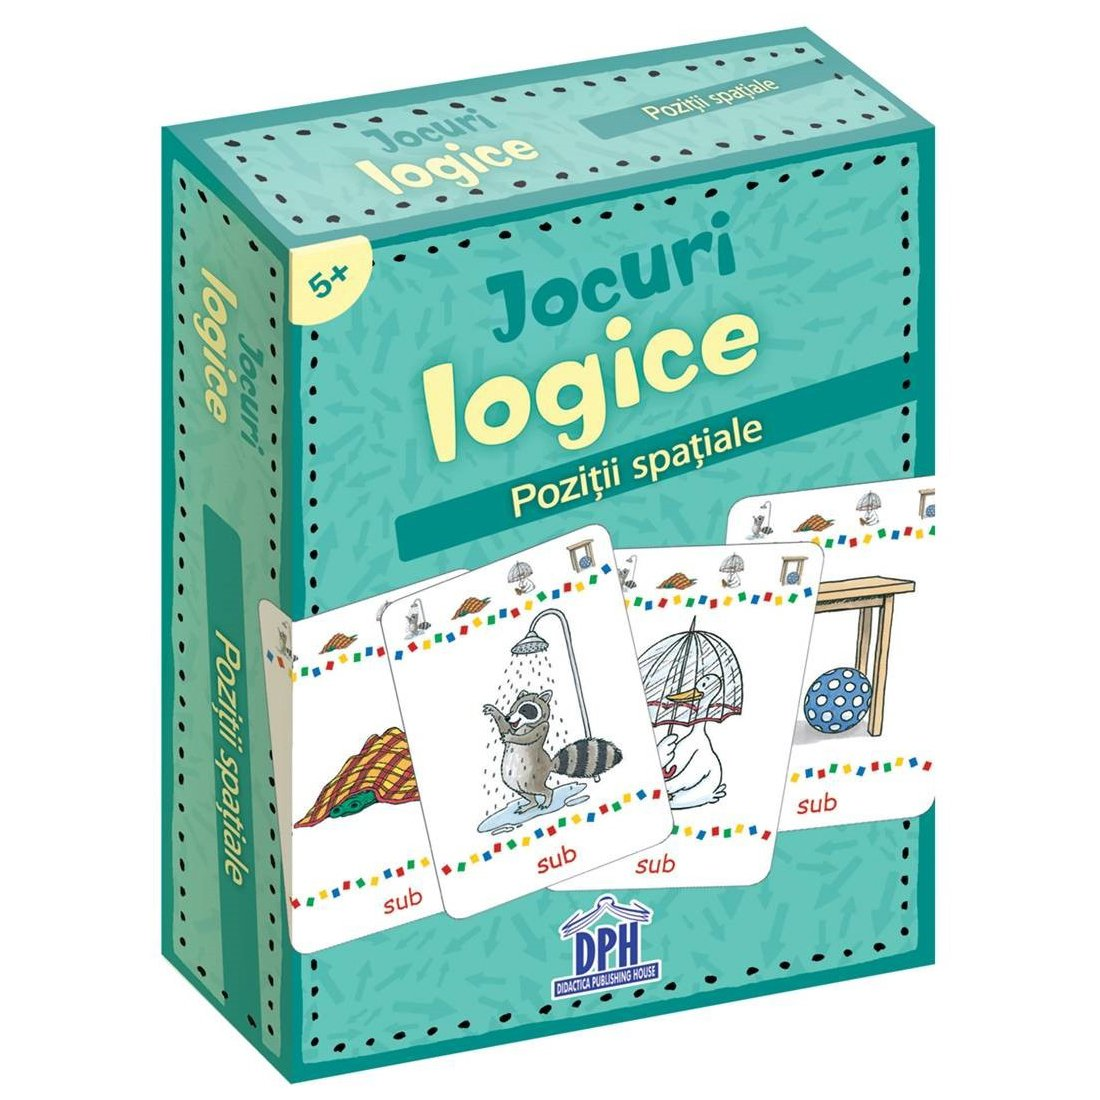 Jocuri logice, Pozitii spatiale, Editura DPH, 48 jetoane imagine 2021